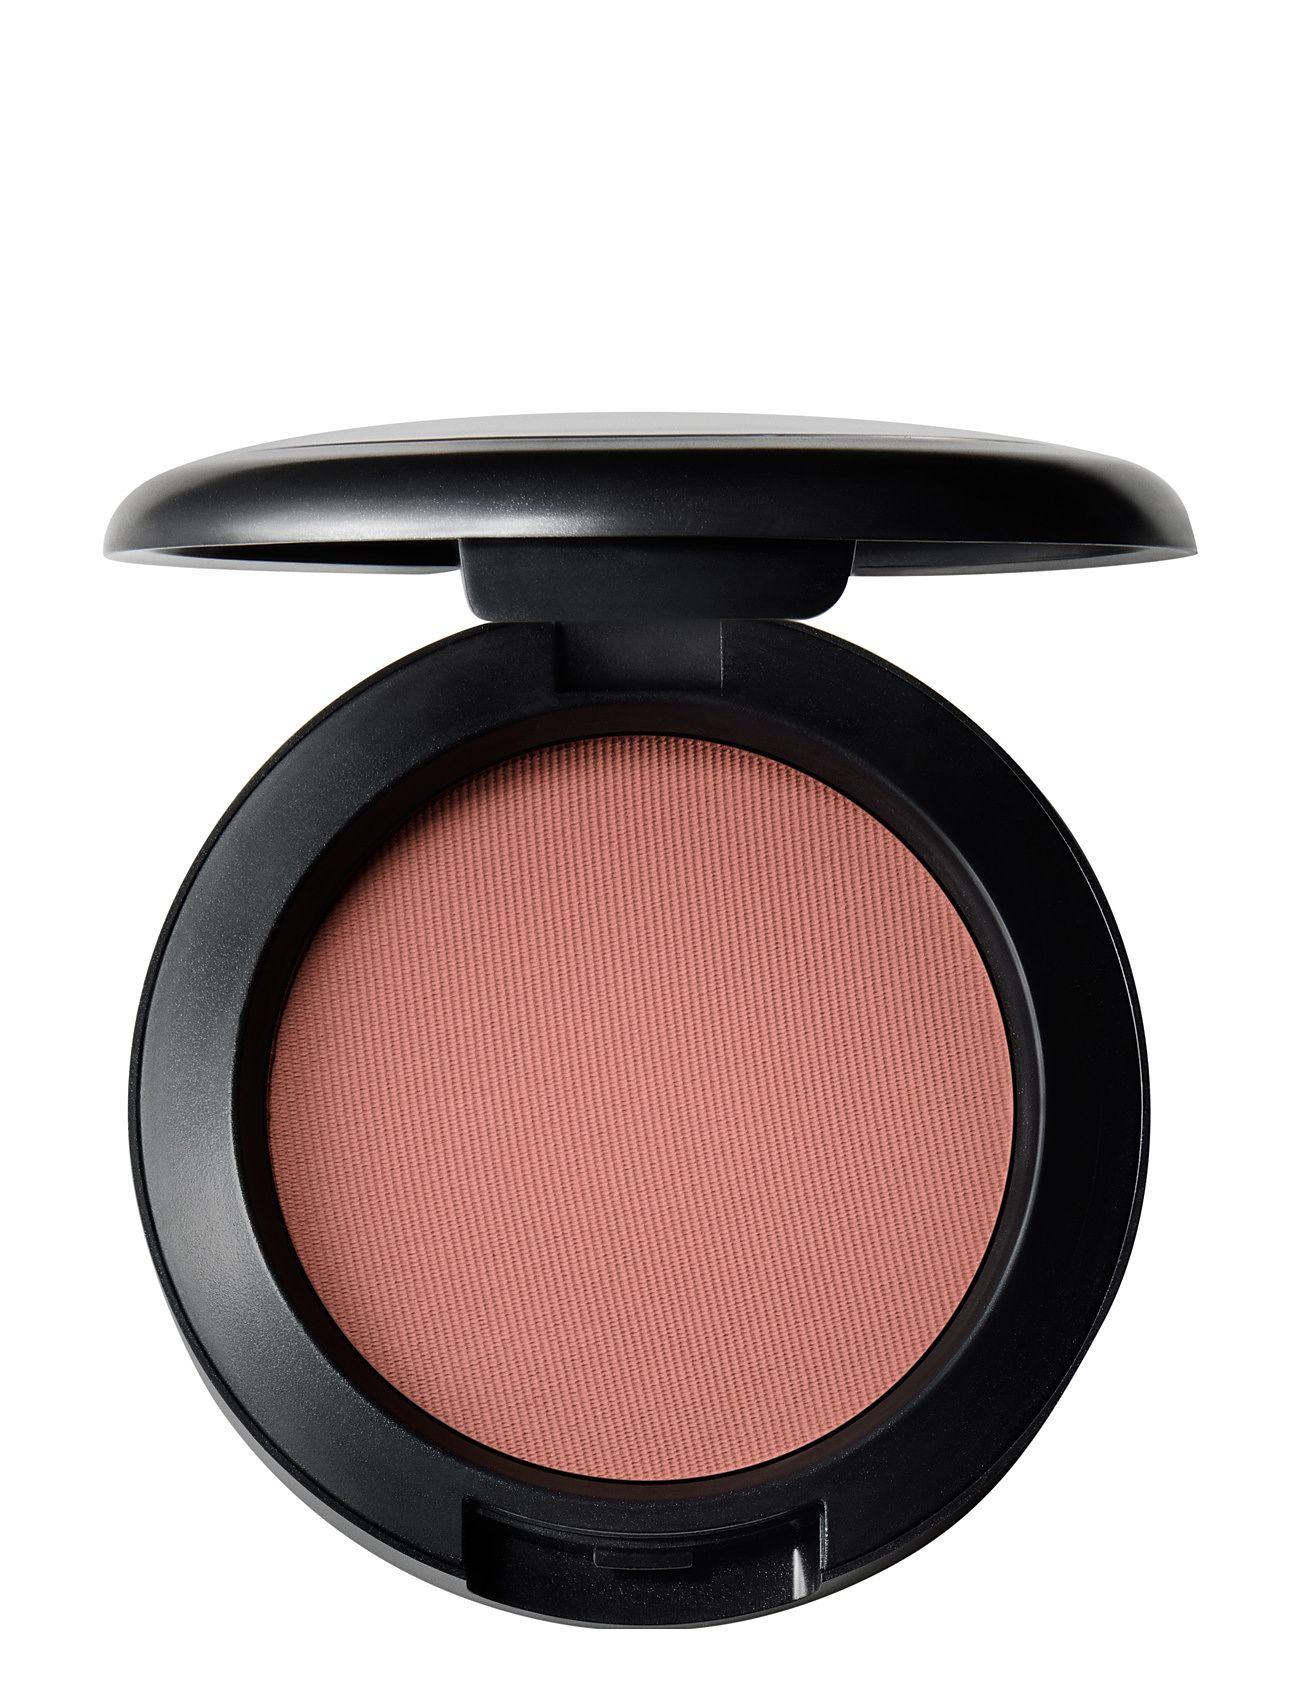 Image of Matte Melba Beauty WOMEN Makeup Face Blush Lyserød M.A.C. (3406684295)